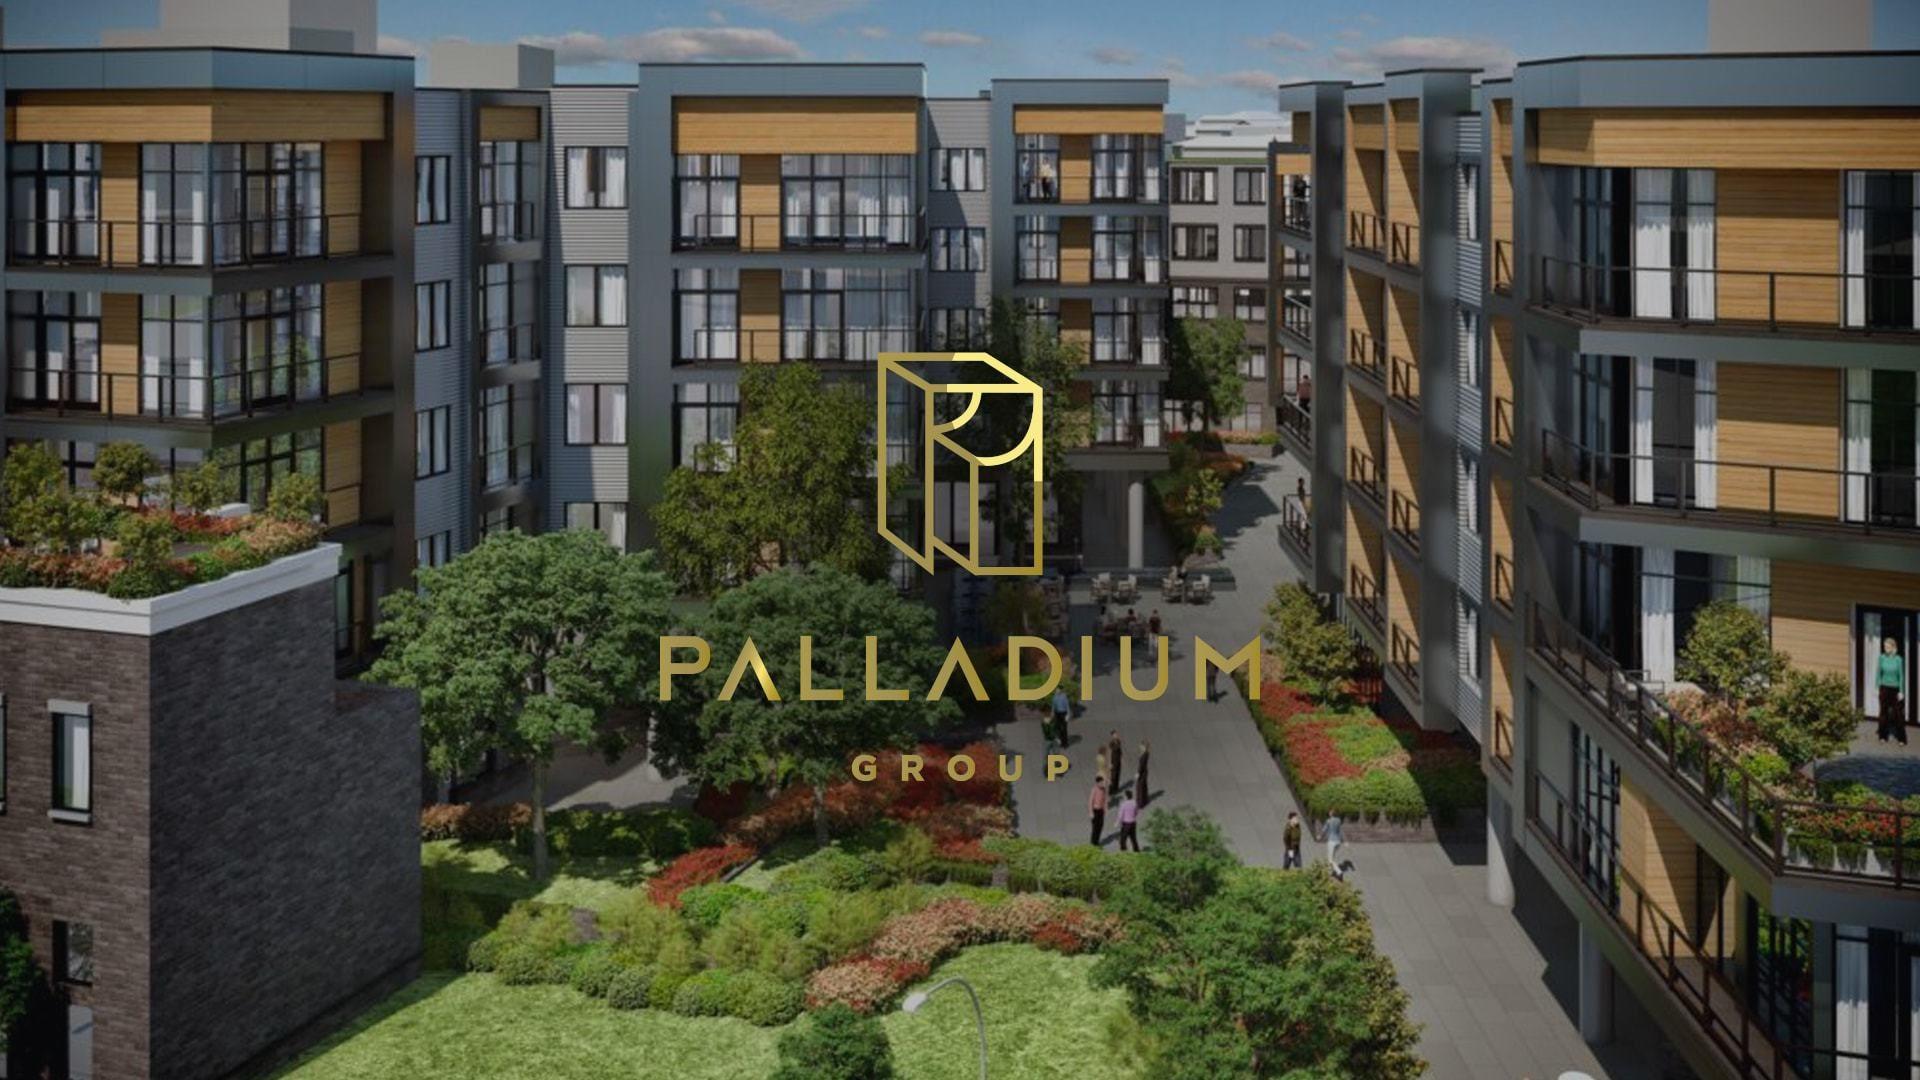 Palladium Group Website Design and Development